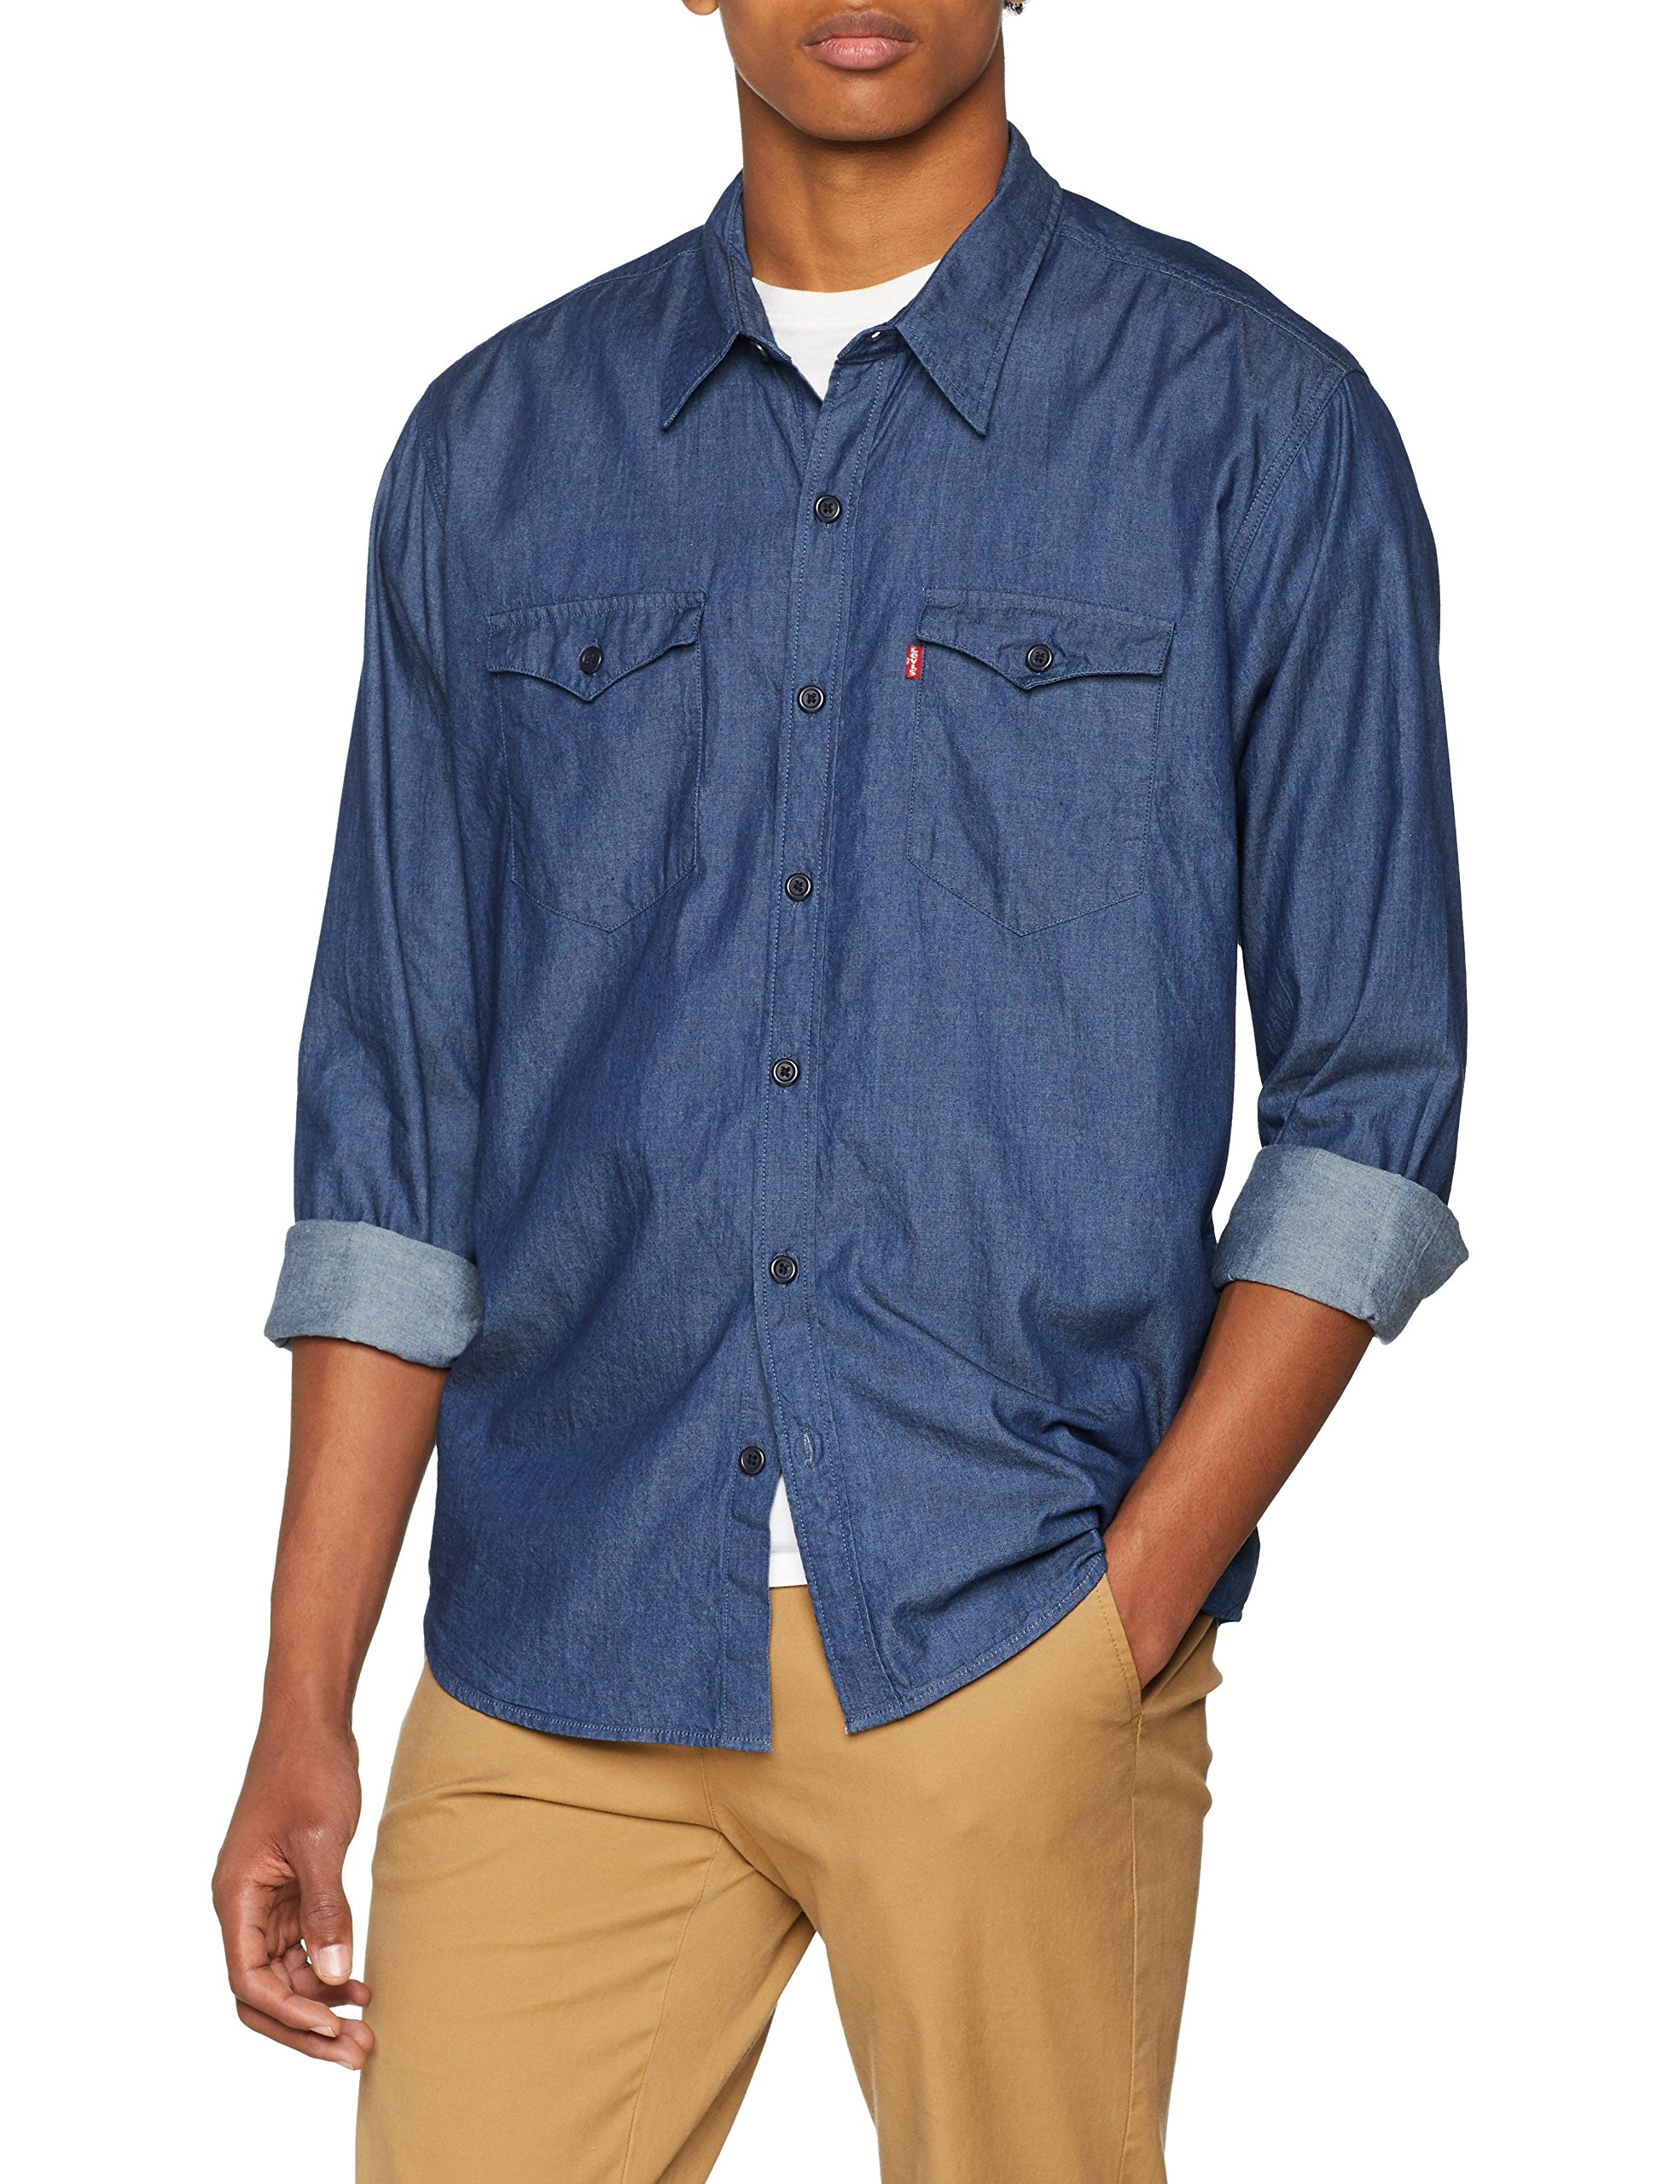 Levi's Modern Barstow Western Camisa Vaquera para Hombre